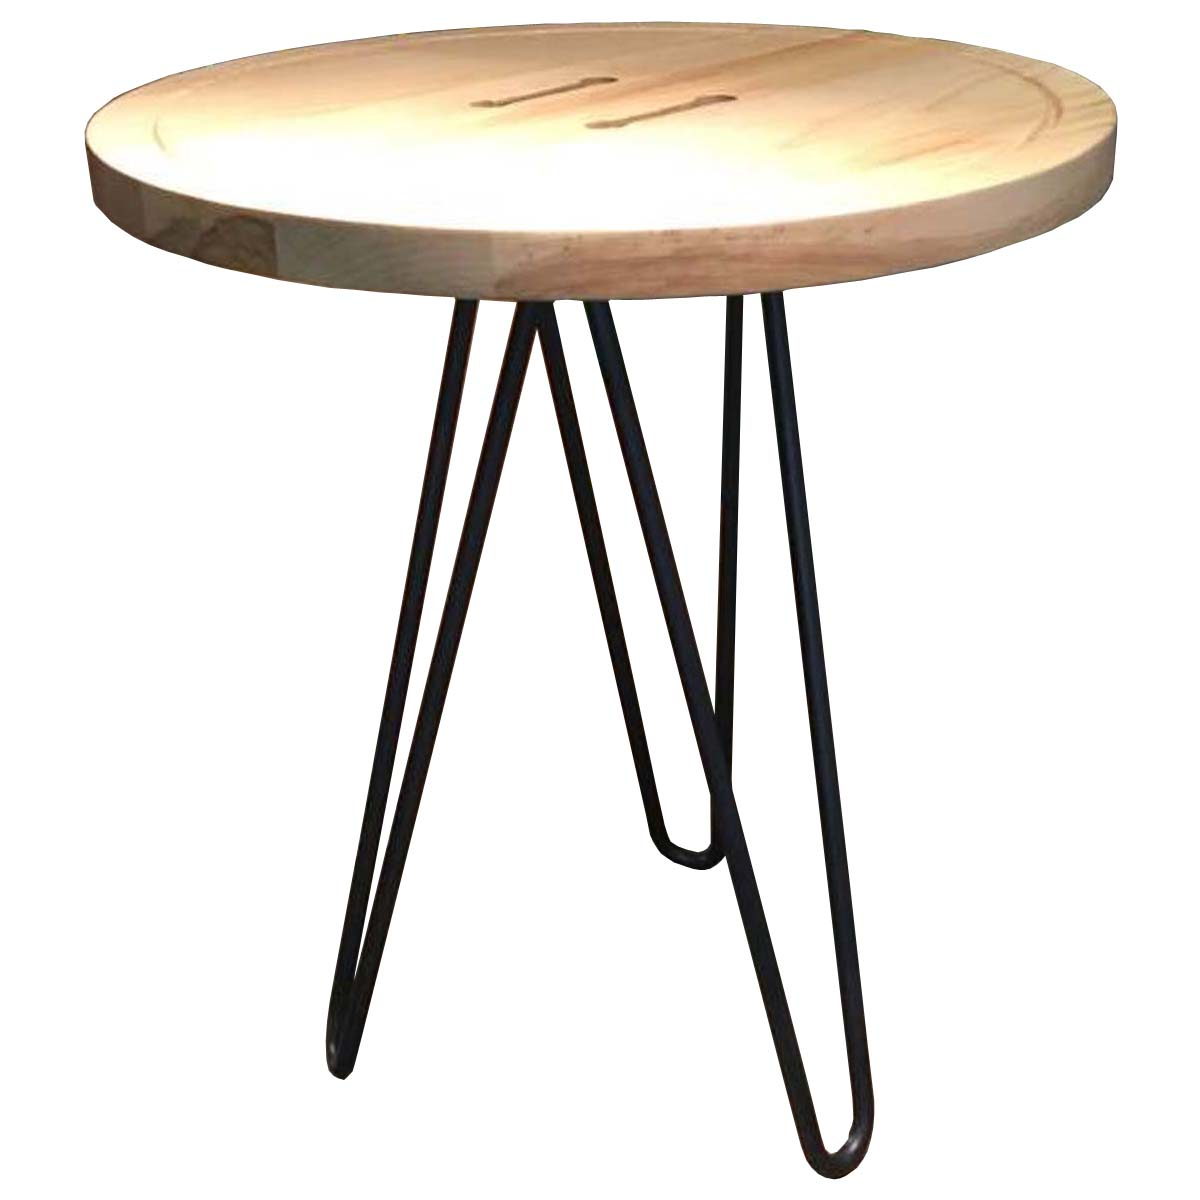 Chrome table base tablebases com quality table bases metal table - Metal End Table Legs Giftoncard Info